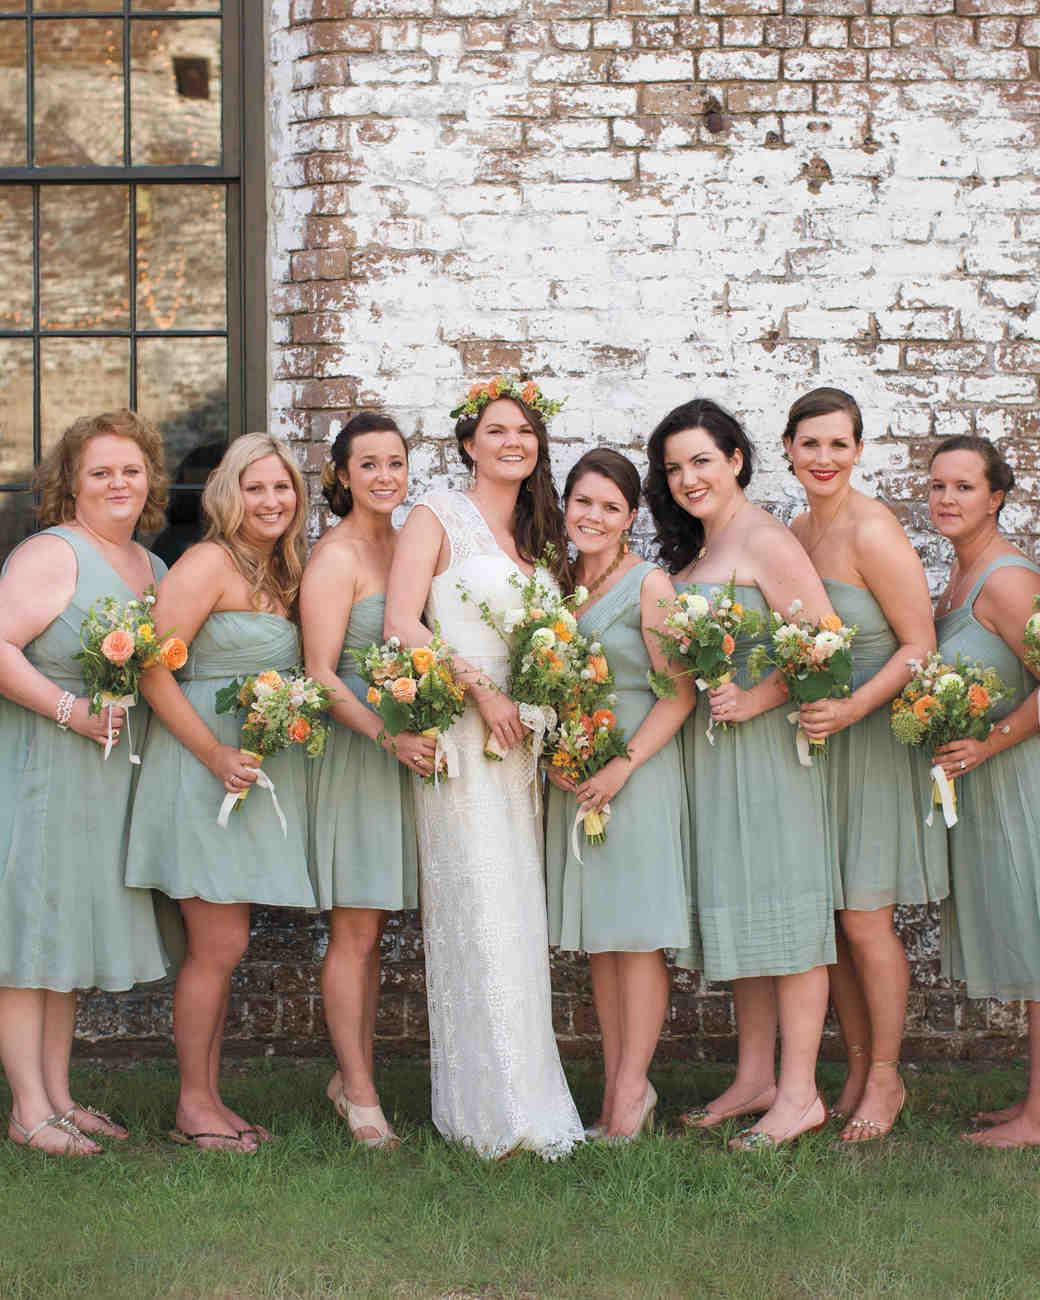 maggie-bryan-bridesmaids-0001-2-mwd108897.jpg